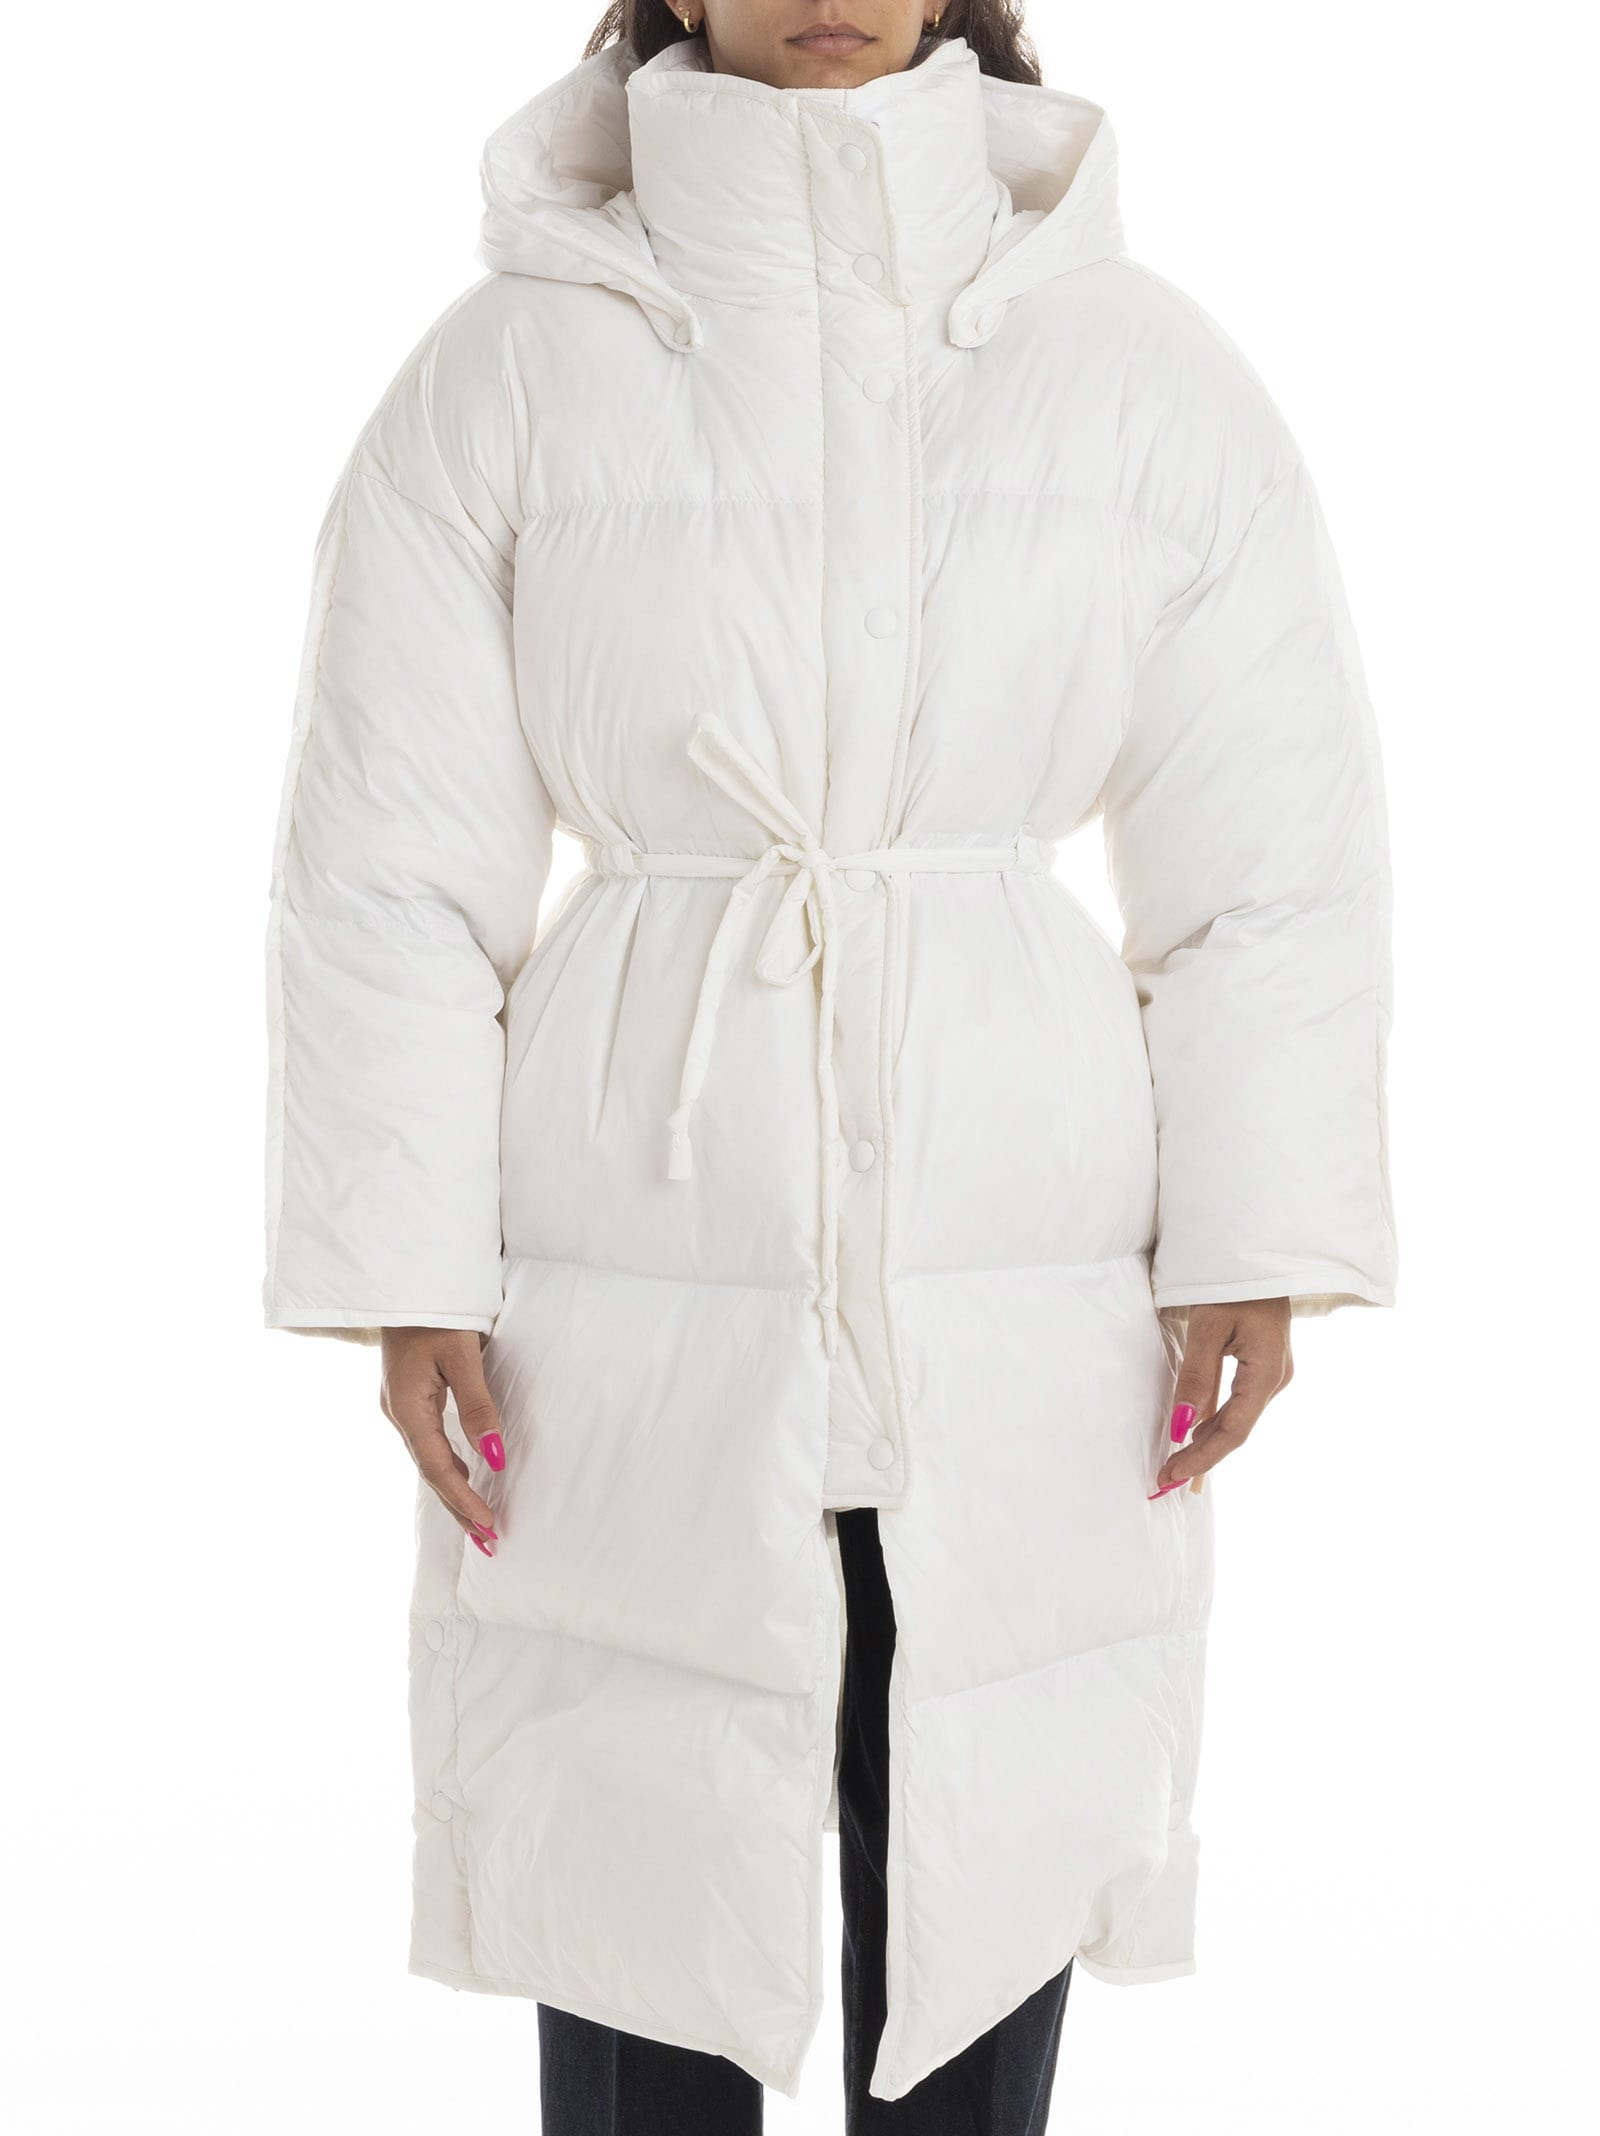 Photo of  Acne Studios Ottie Nylon Puffer- shop Acne Studios jackets online sales